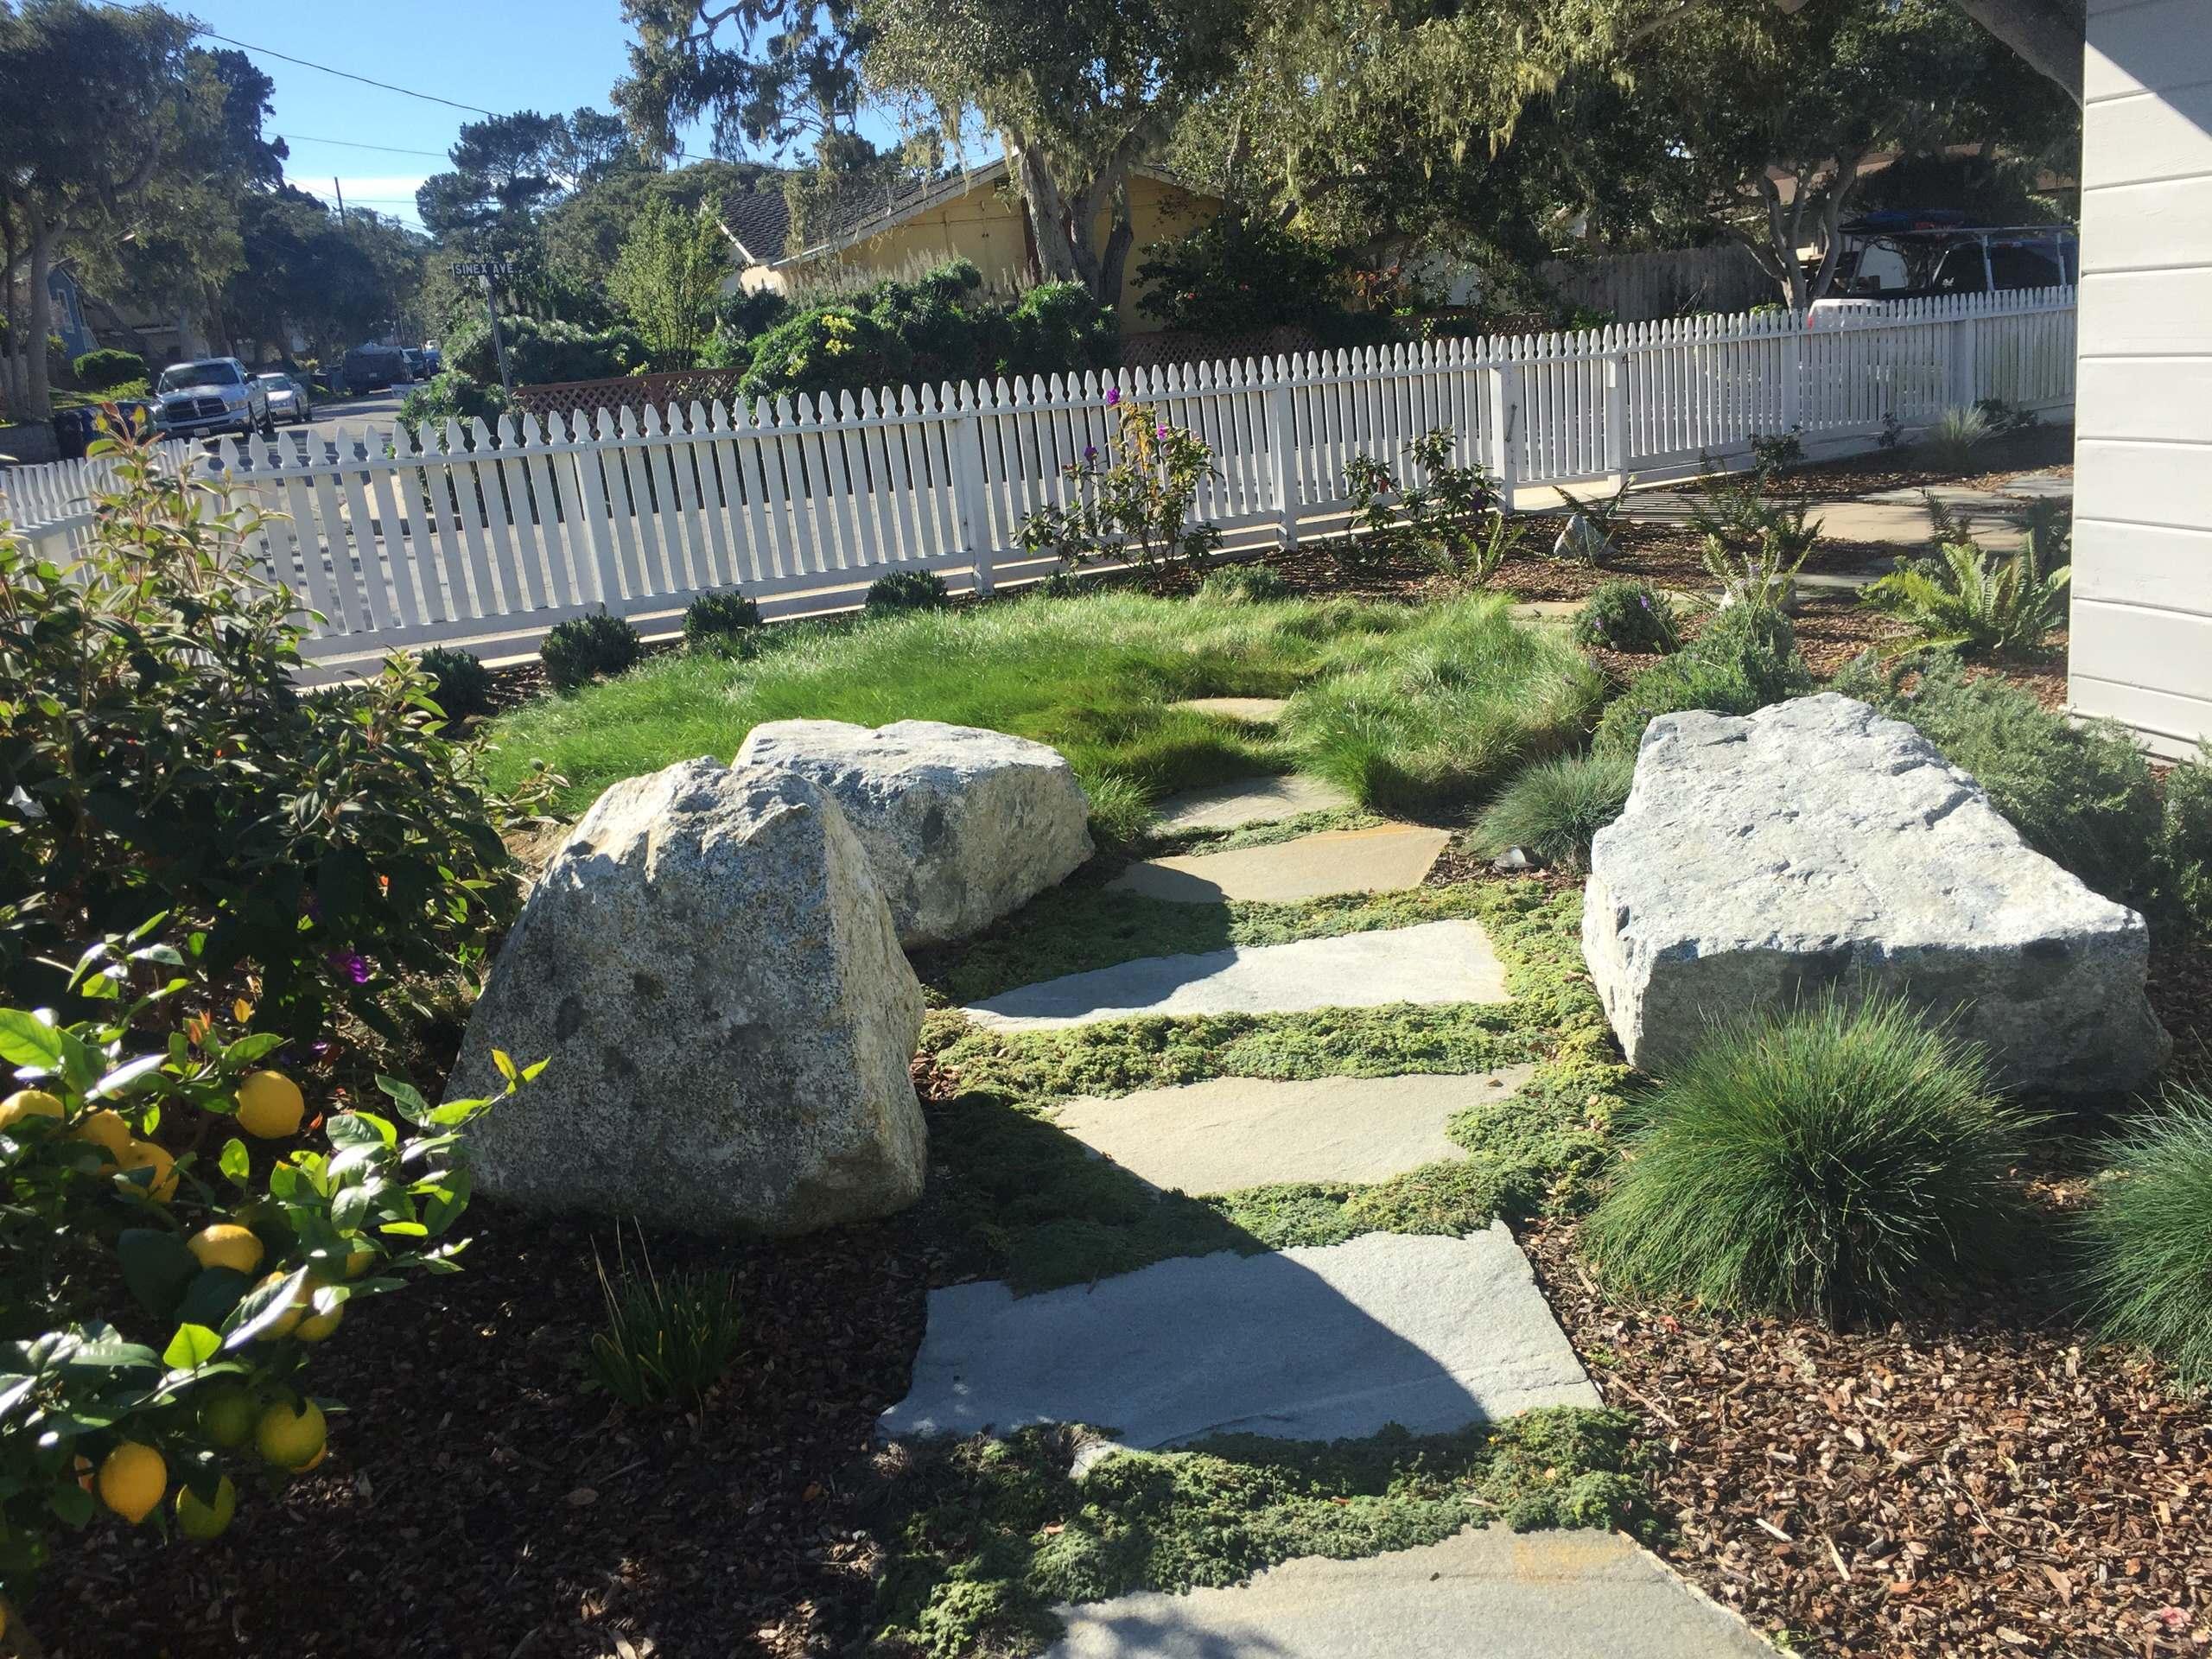 Pacific Grove Coastal Refuge